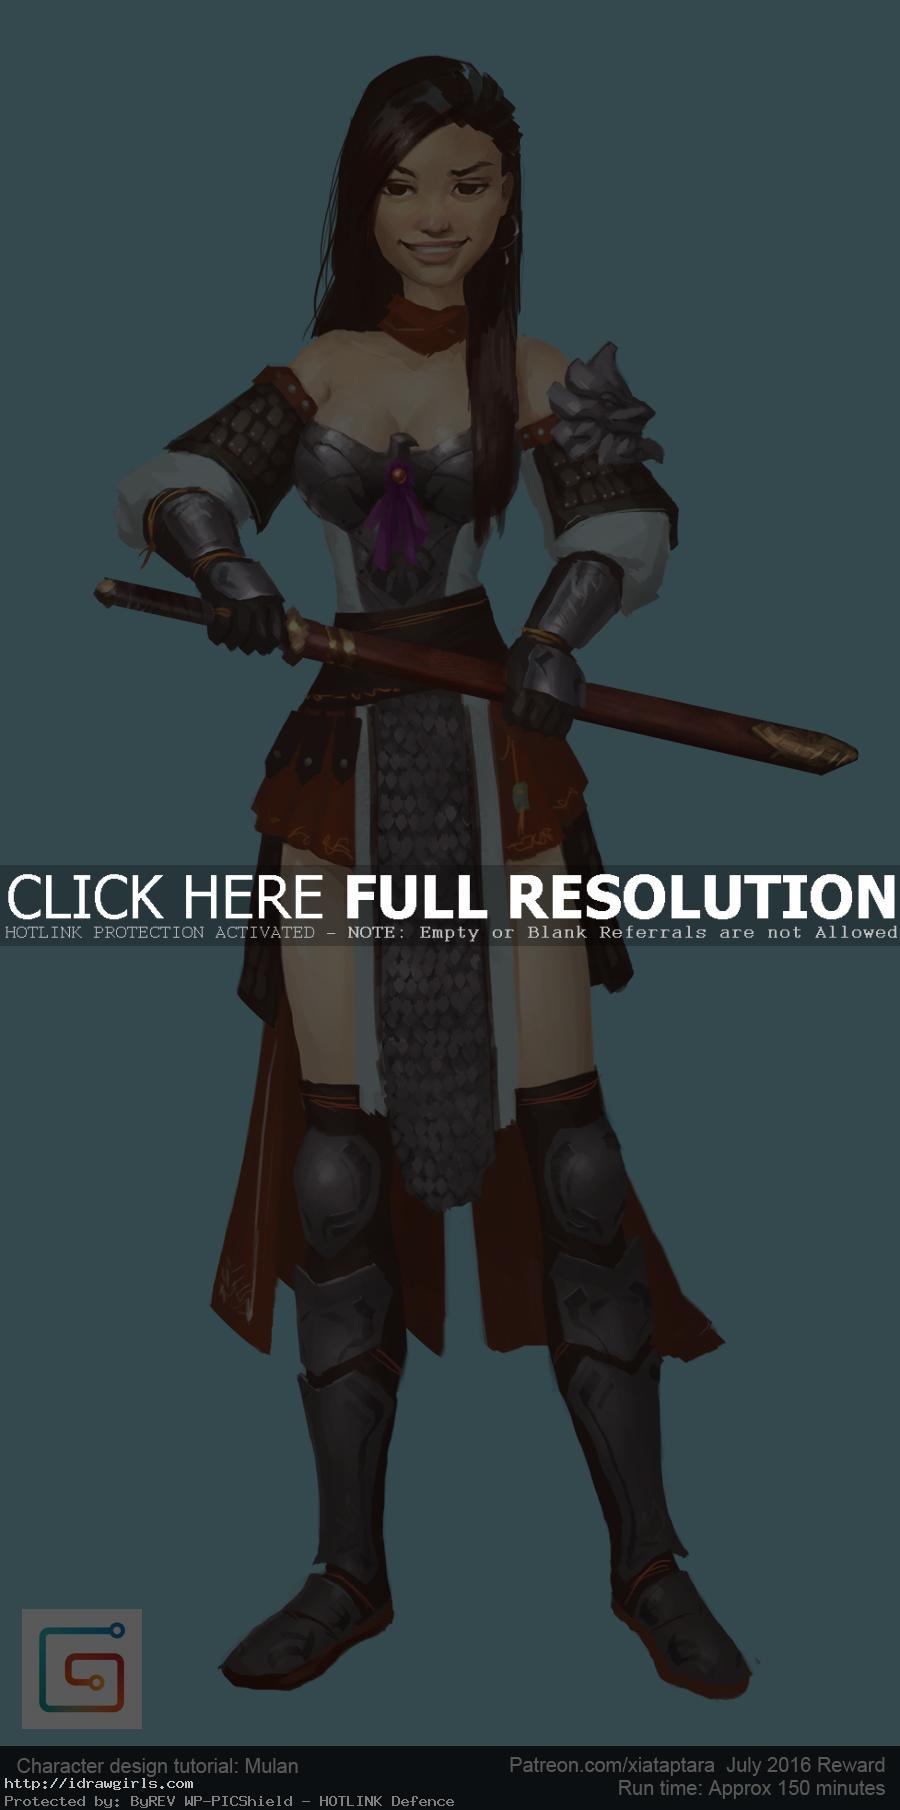 Character Design Tutorial Lynda : Character design tutorial mulan drawing and digital